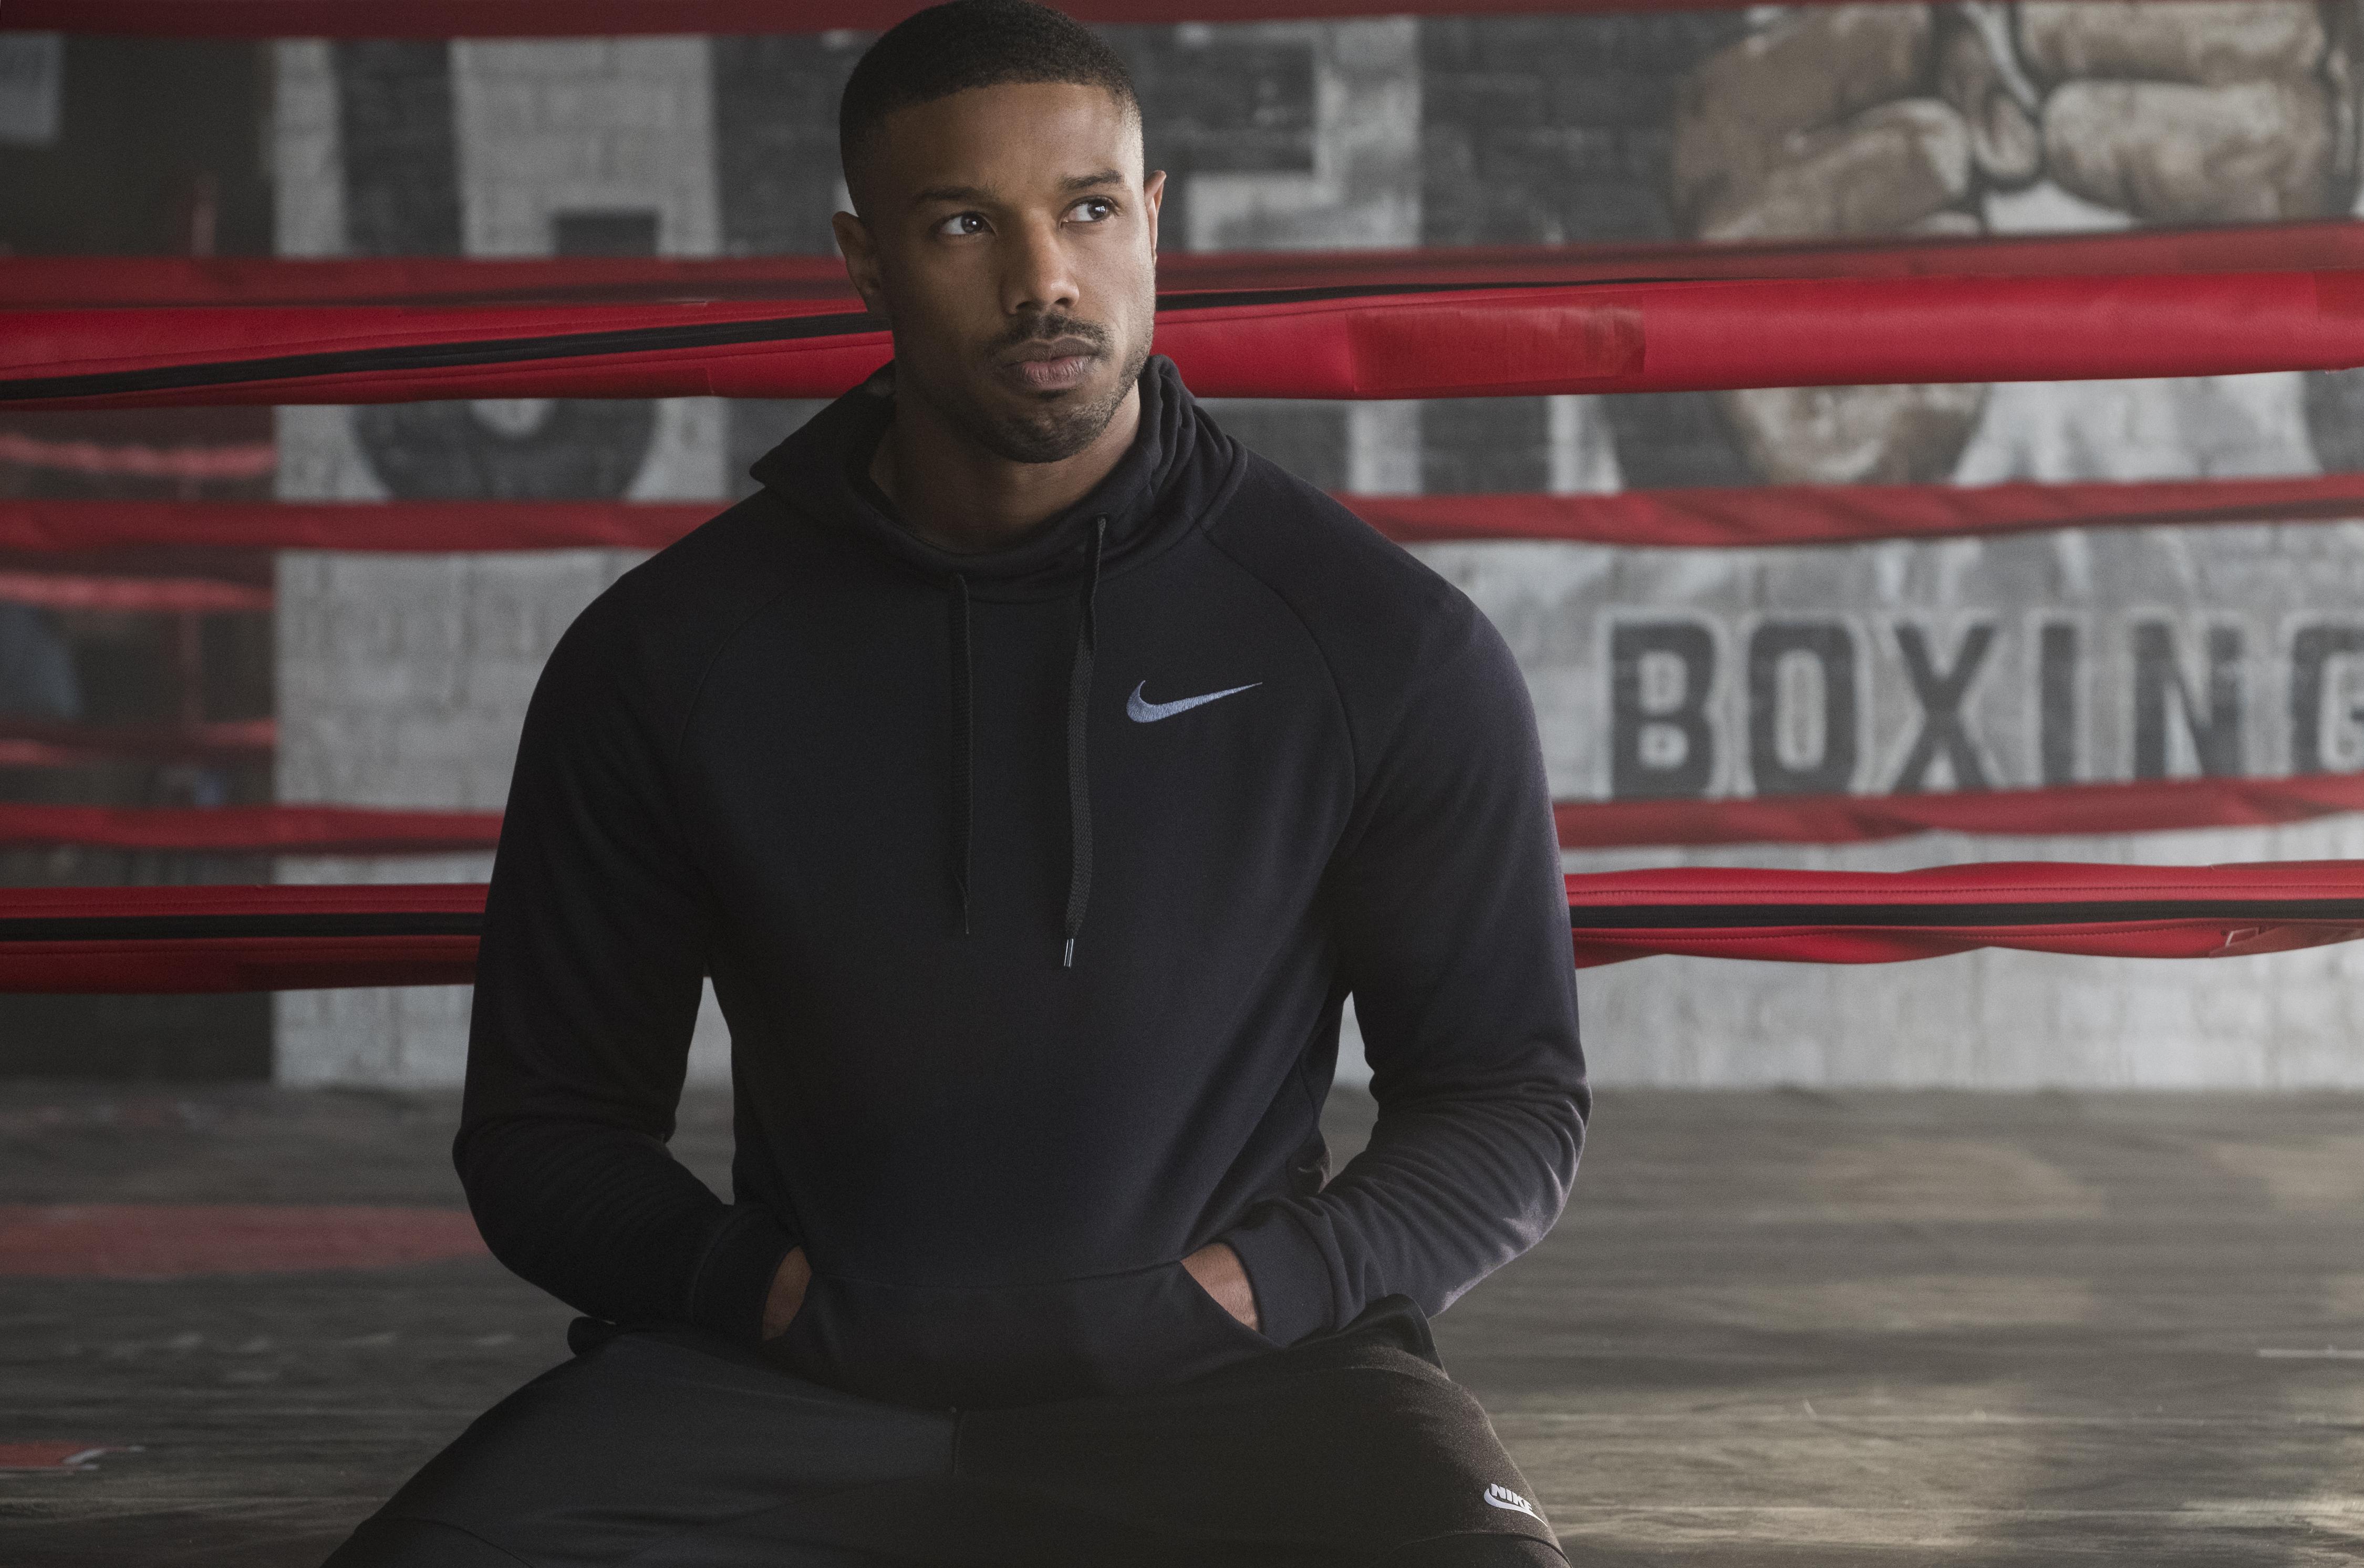 Jordan, Caple Jr. Discuss Returning to the Ring in 'Creed II'